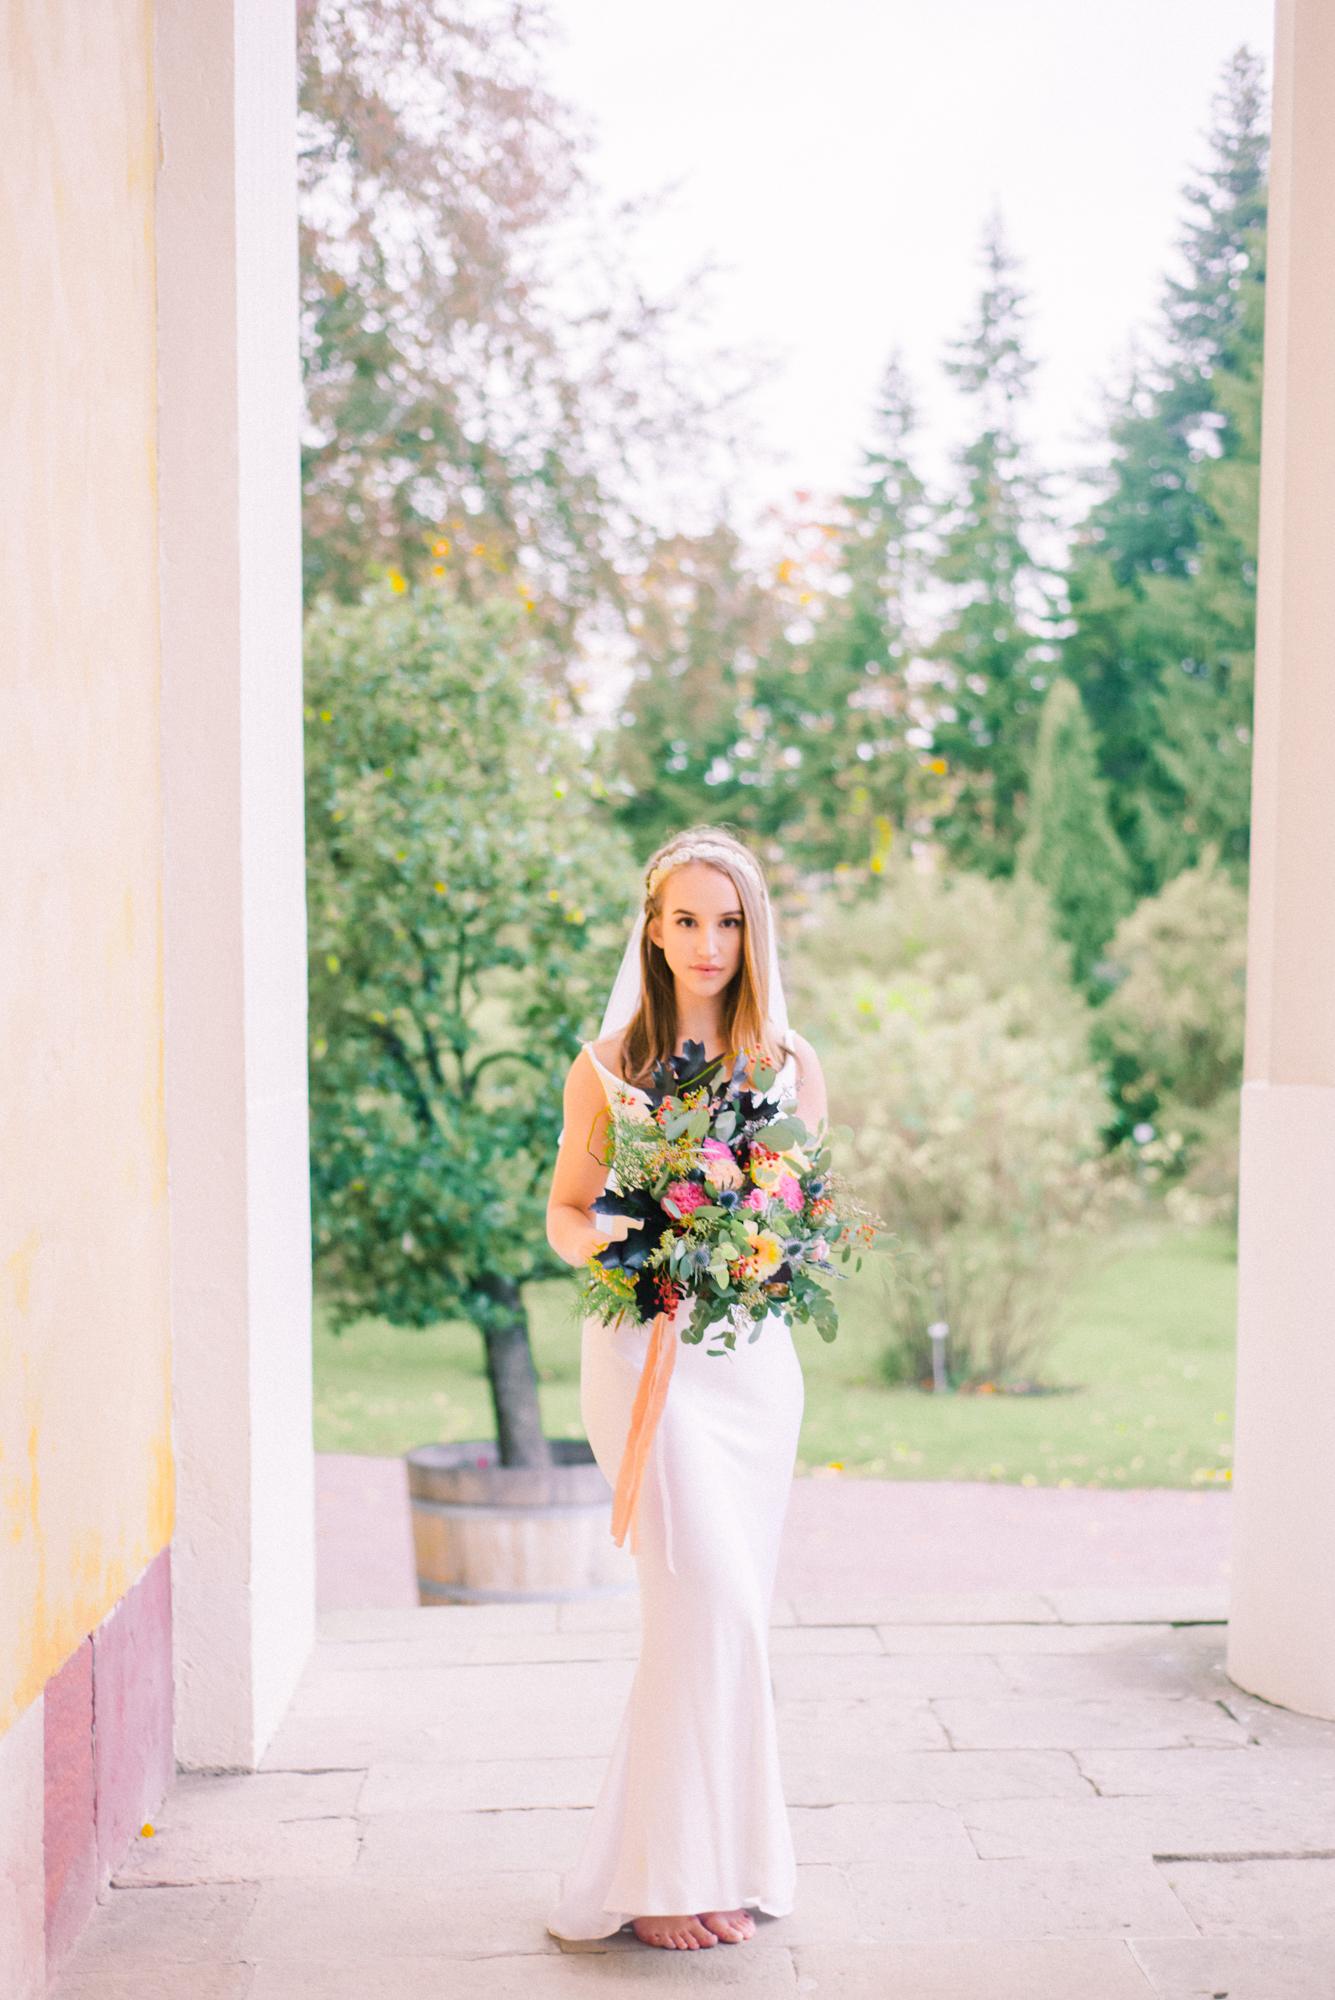 Elegant Organic Fall Swedish Bridal Wedding Styled Shoot - Erika Alvarenga Photography-118.jpg